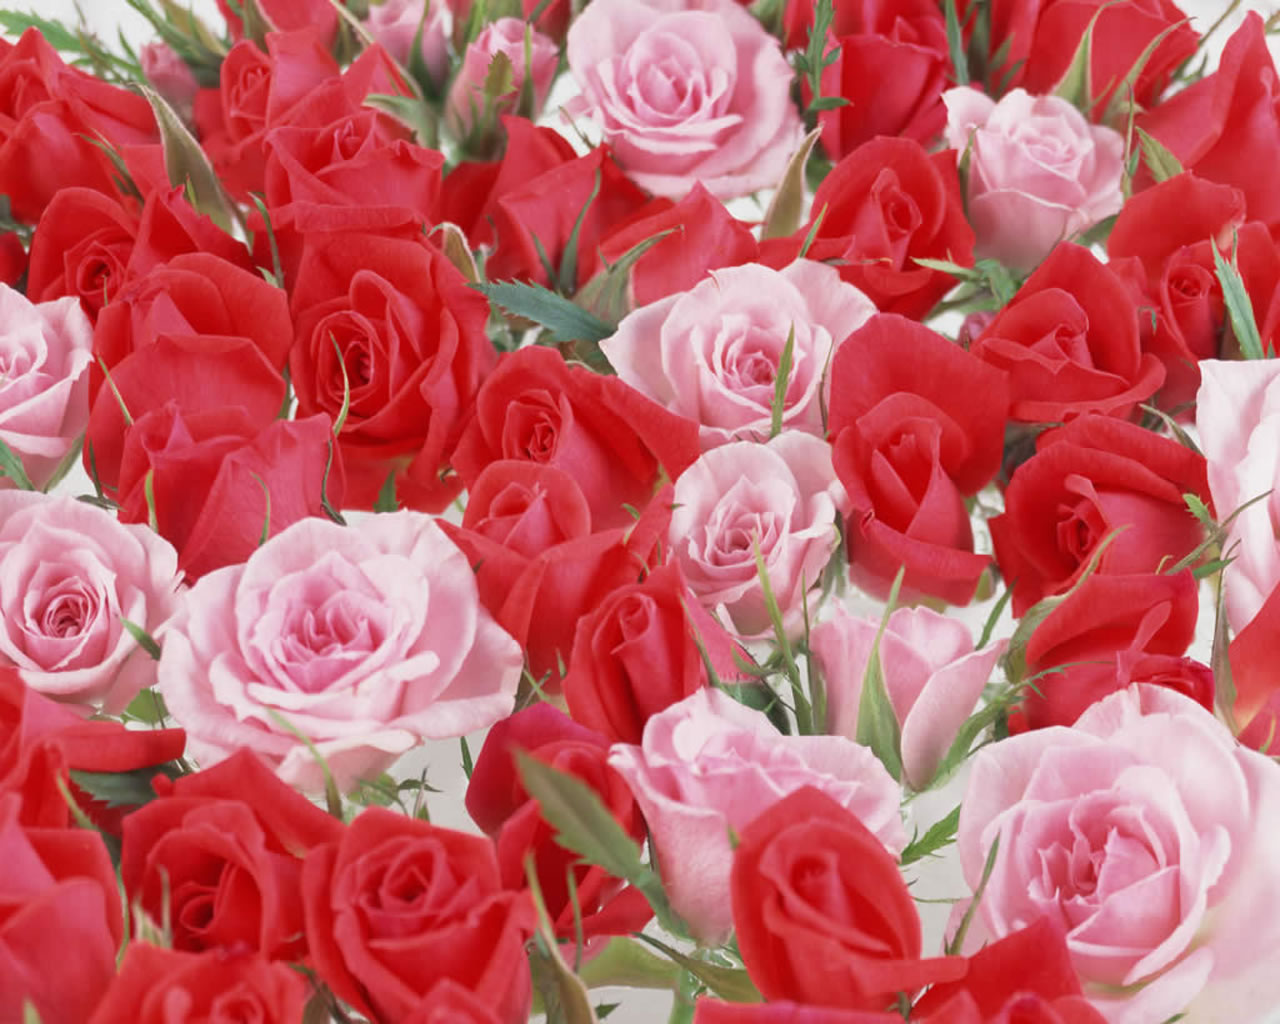 Beautiful rose flowers wallpapers wallpapersafari flowers pictures flowers wallpapers red roses 1280x1024 izmirmasajfo